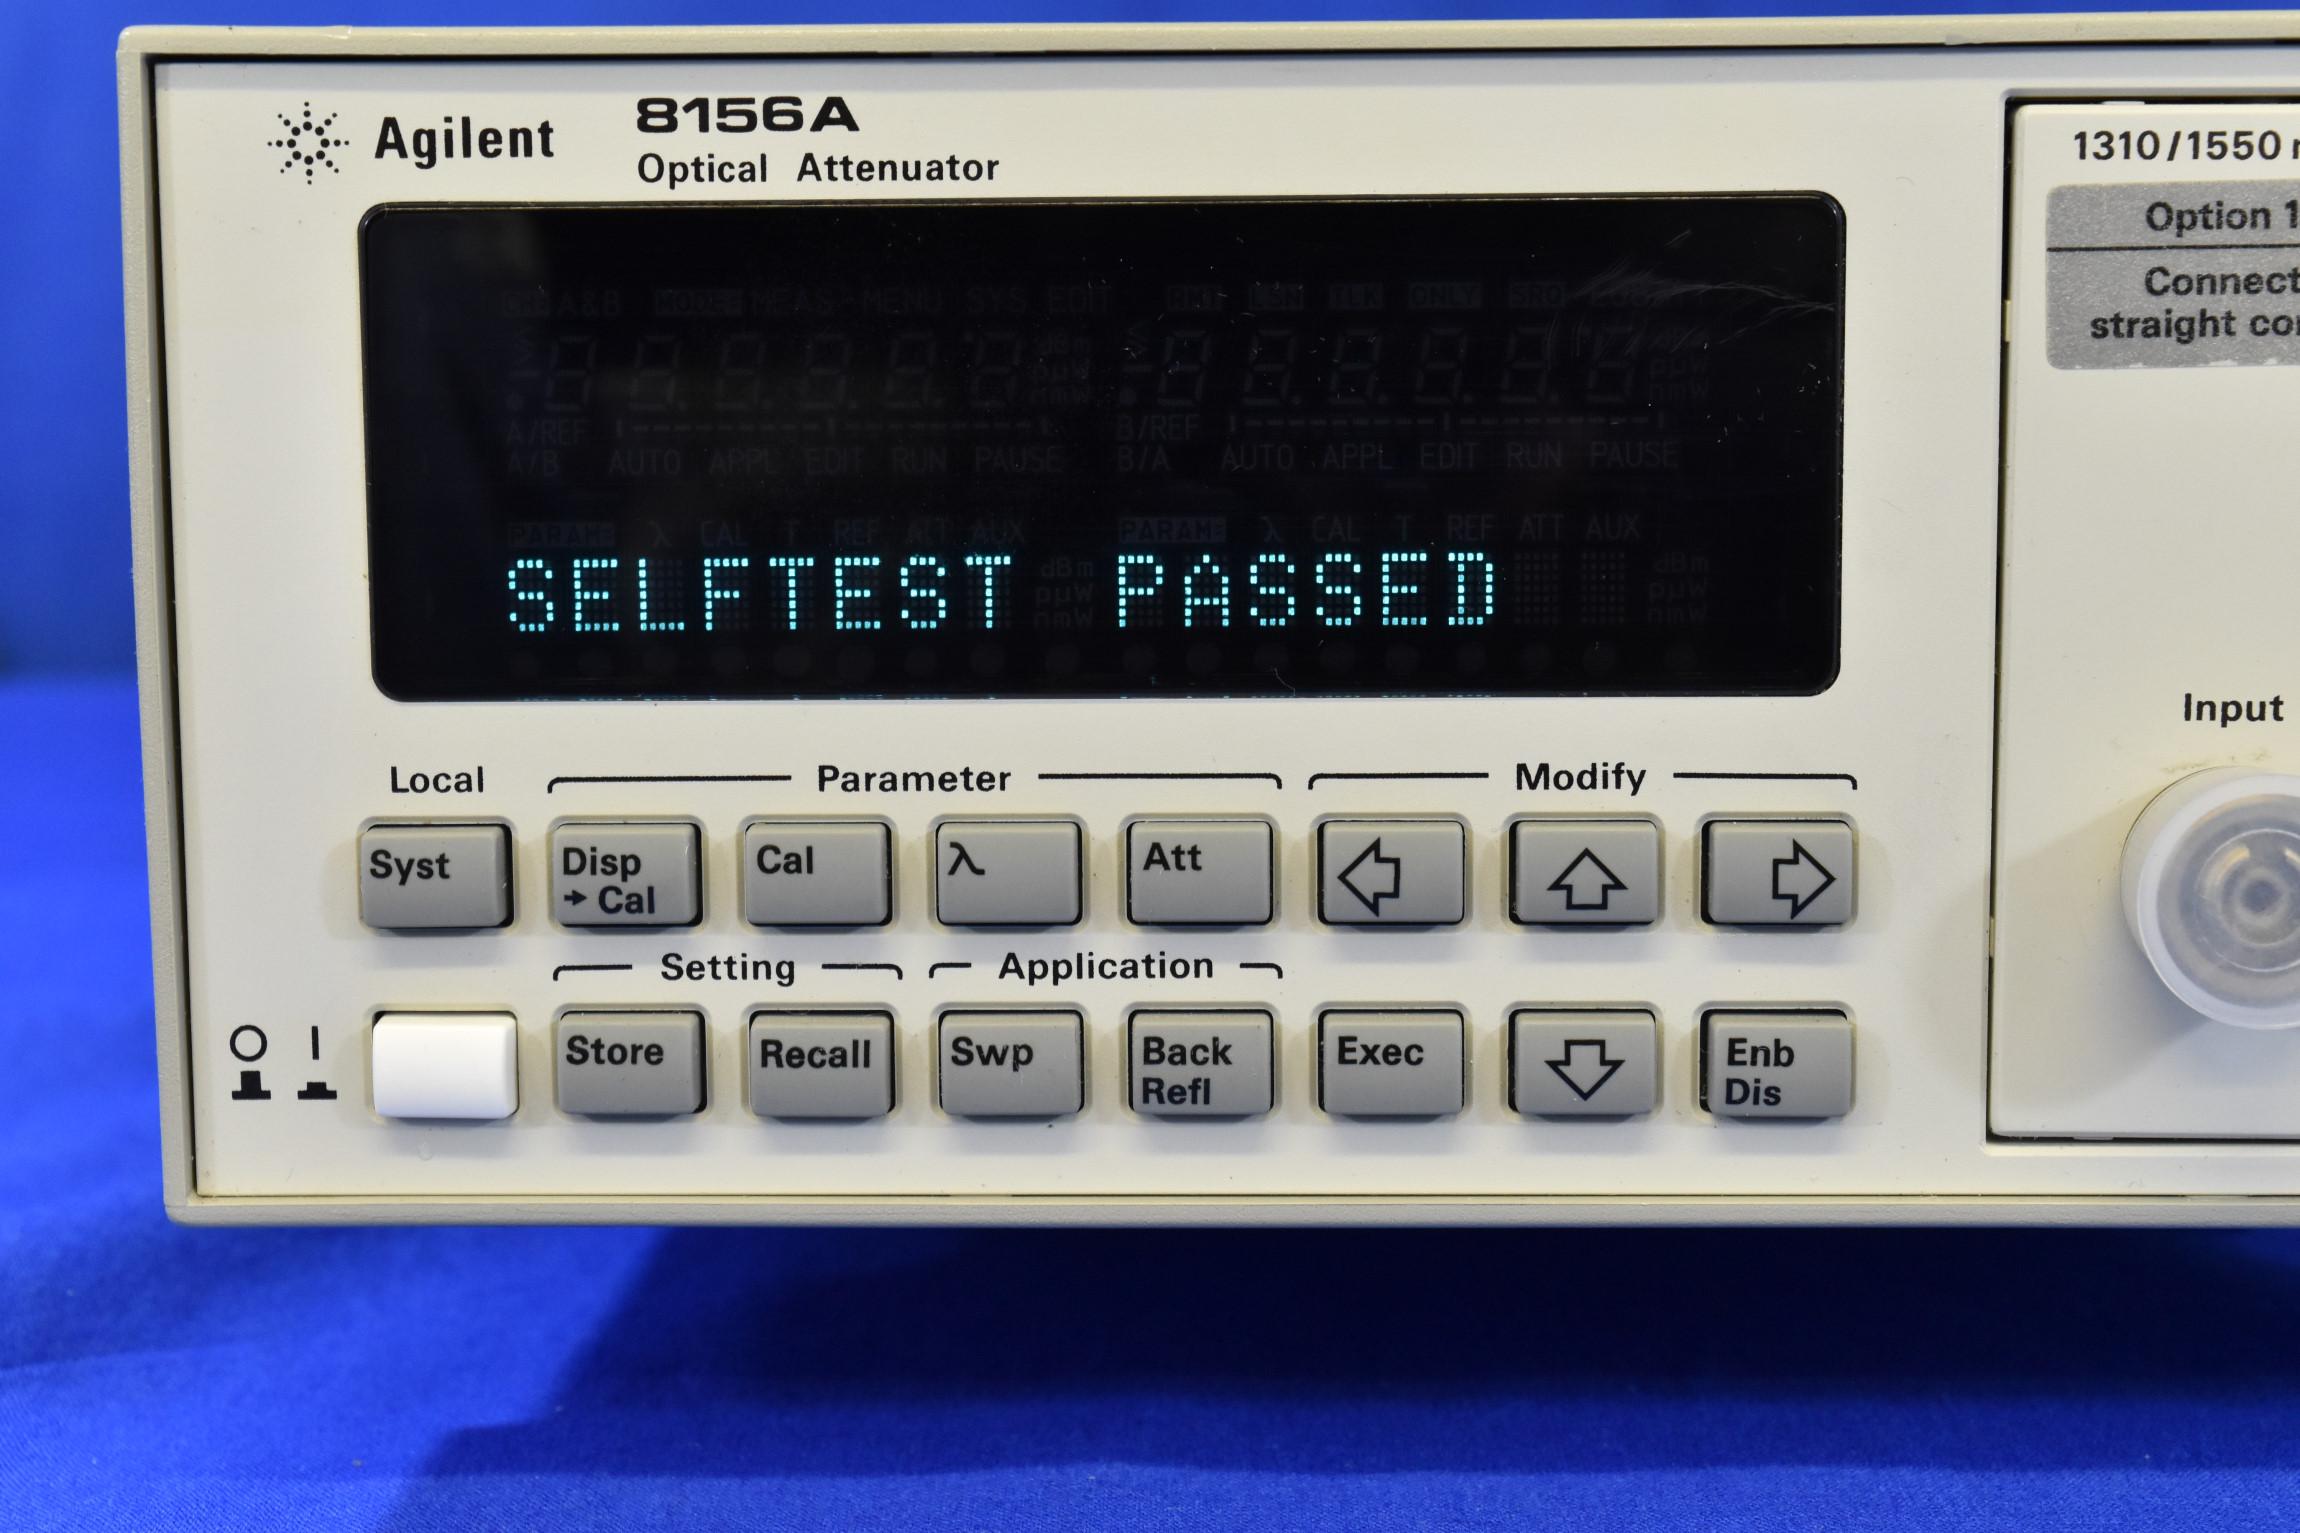 SN 580_005